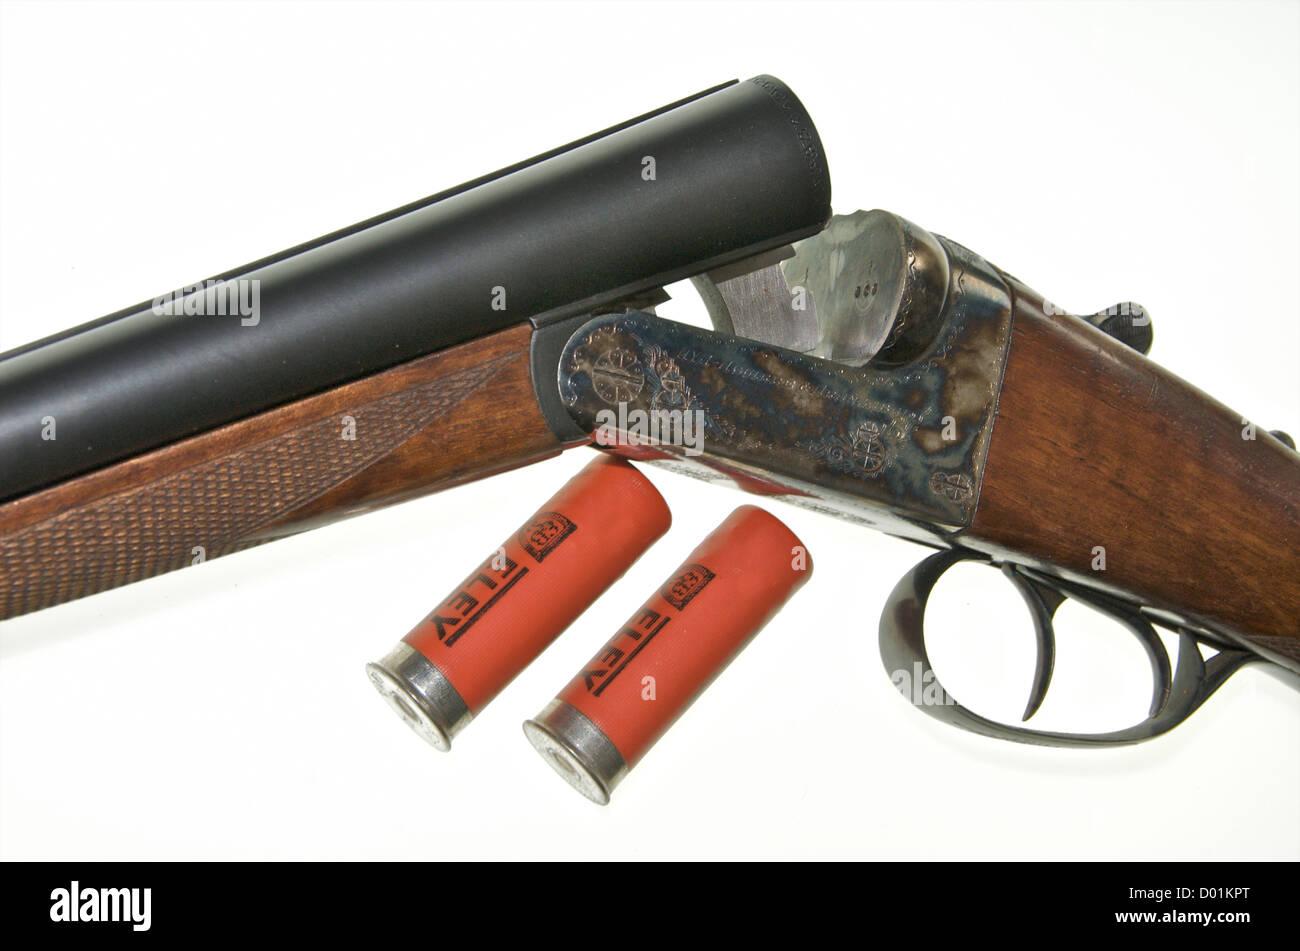 how to make a 12 gauge pipe gun